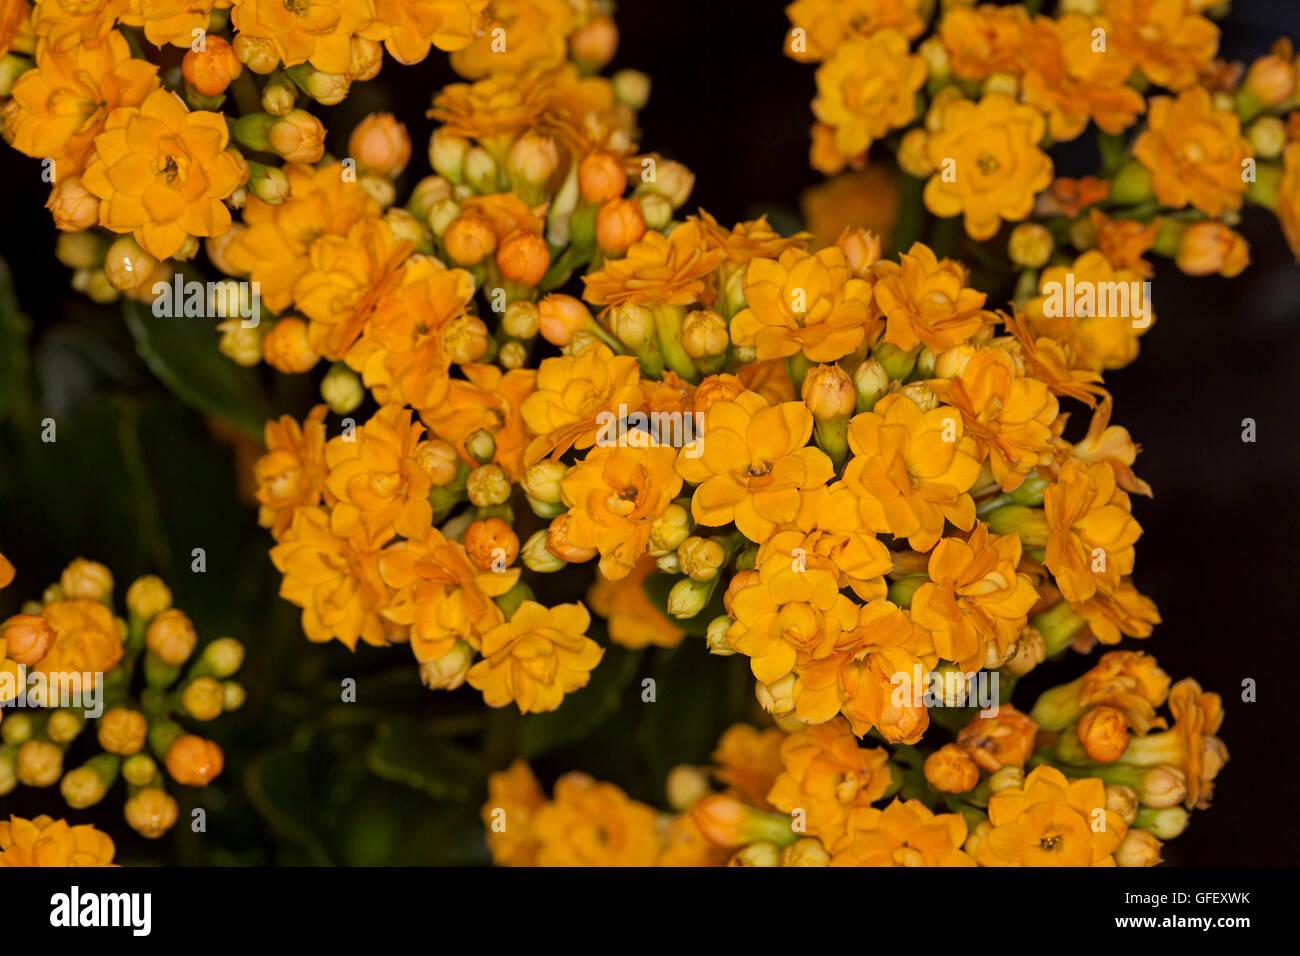 Kalanchoe blossfeldiana stock photos kalanchoe blossfeldiana stock close up of cluster of vivid double golden yellow flowers of succulent plant kalanchoe blossfeldiana mightylinksfo